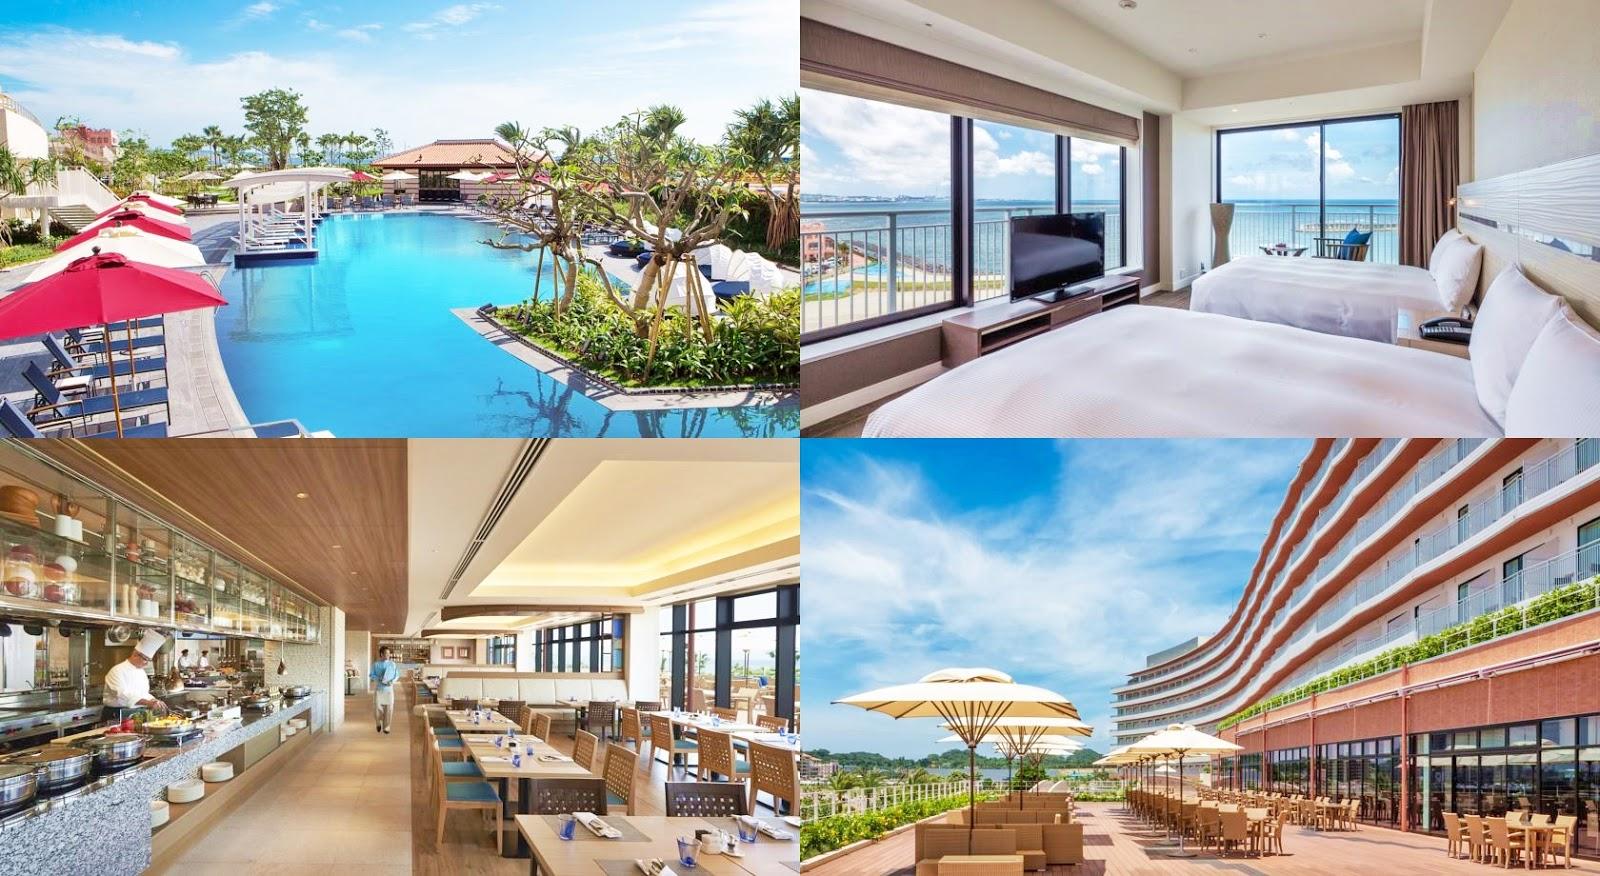 沖繩-住宿-推薦-飯店-旅館-民宿-公寓-沖繩北谷希爾頓度假村-Hilton-Okinawa-Chatan-Resort-Okinawa-hotel-recommendation